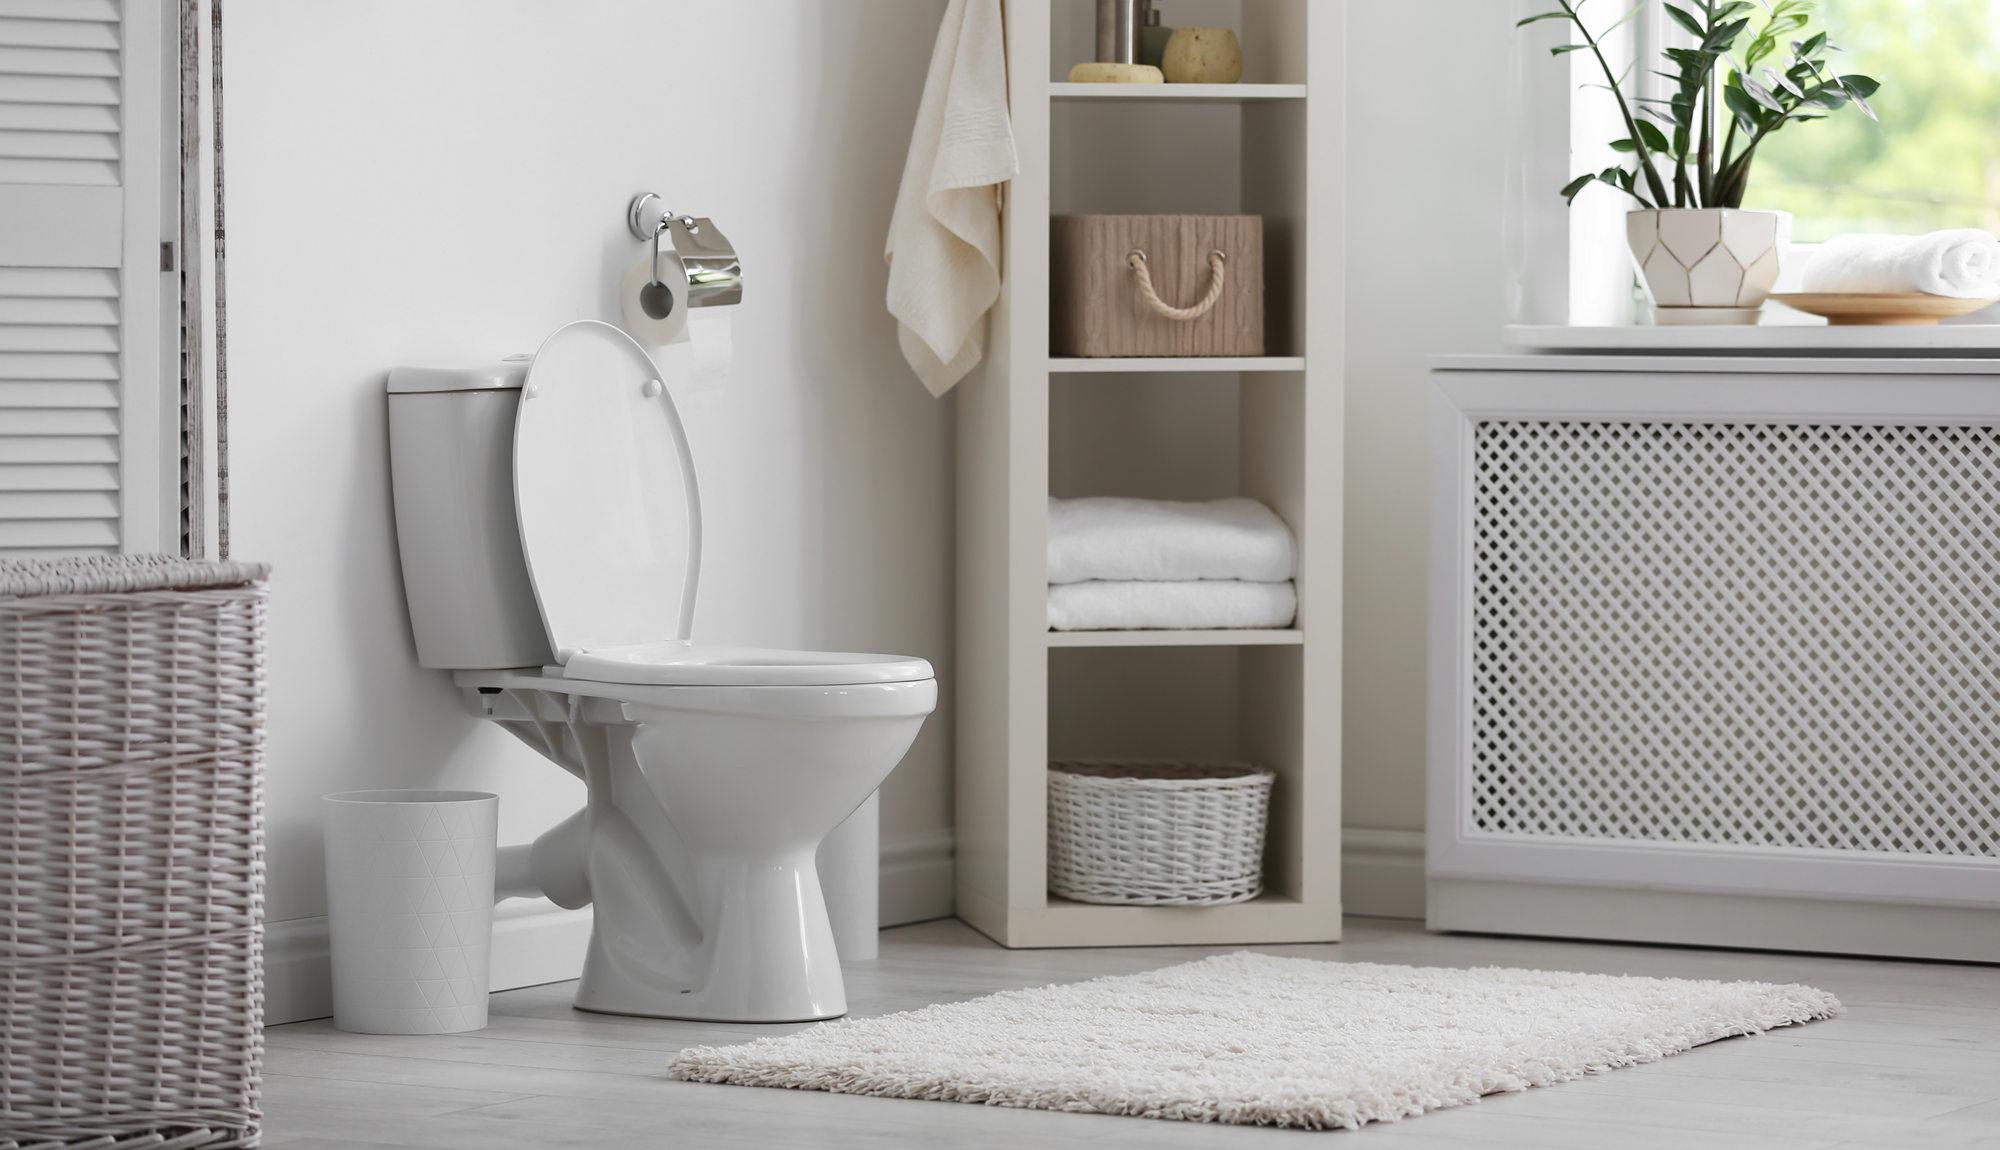 Toilet replacement Atlas HVAC, Inc